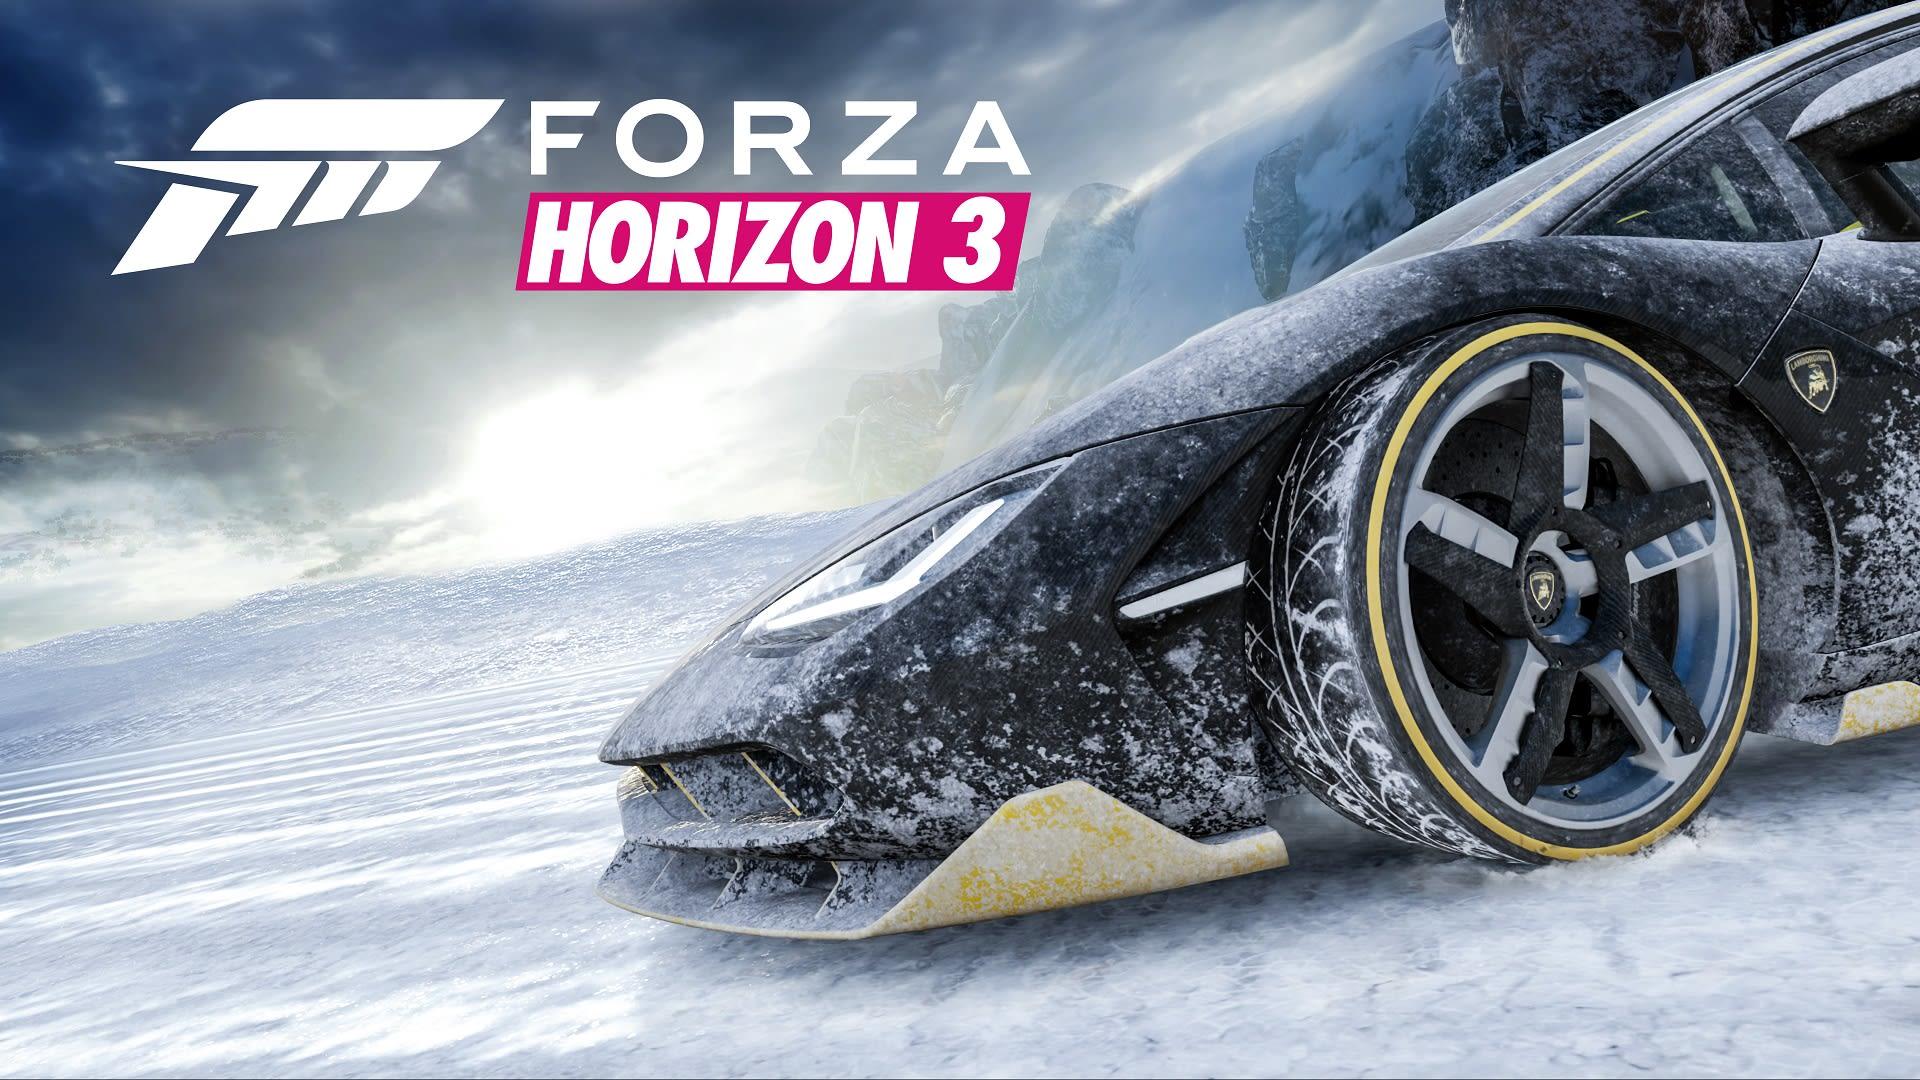 forza horizon 3 download for laptop